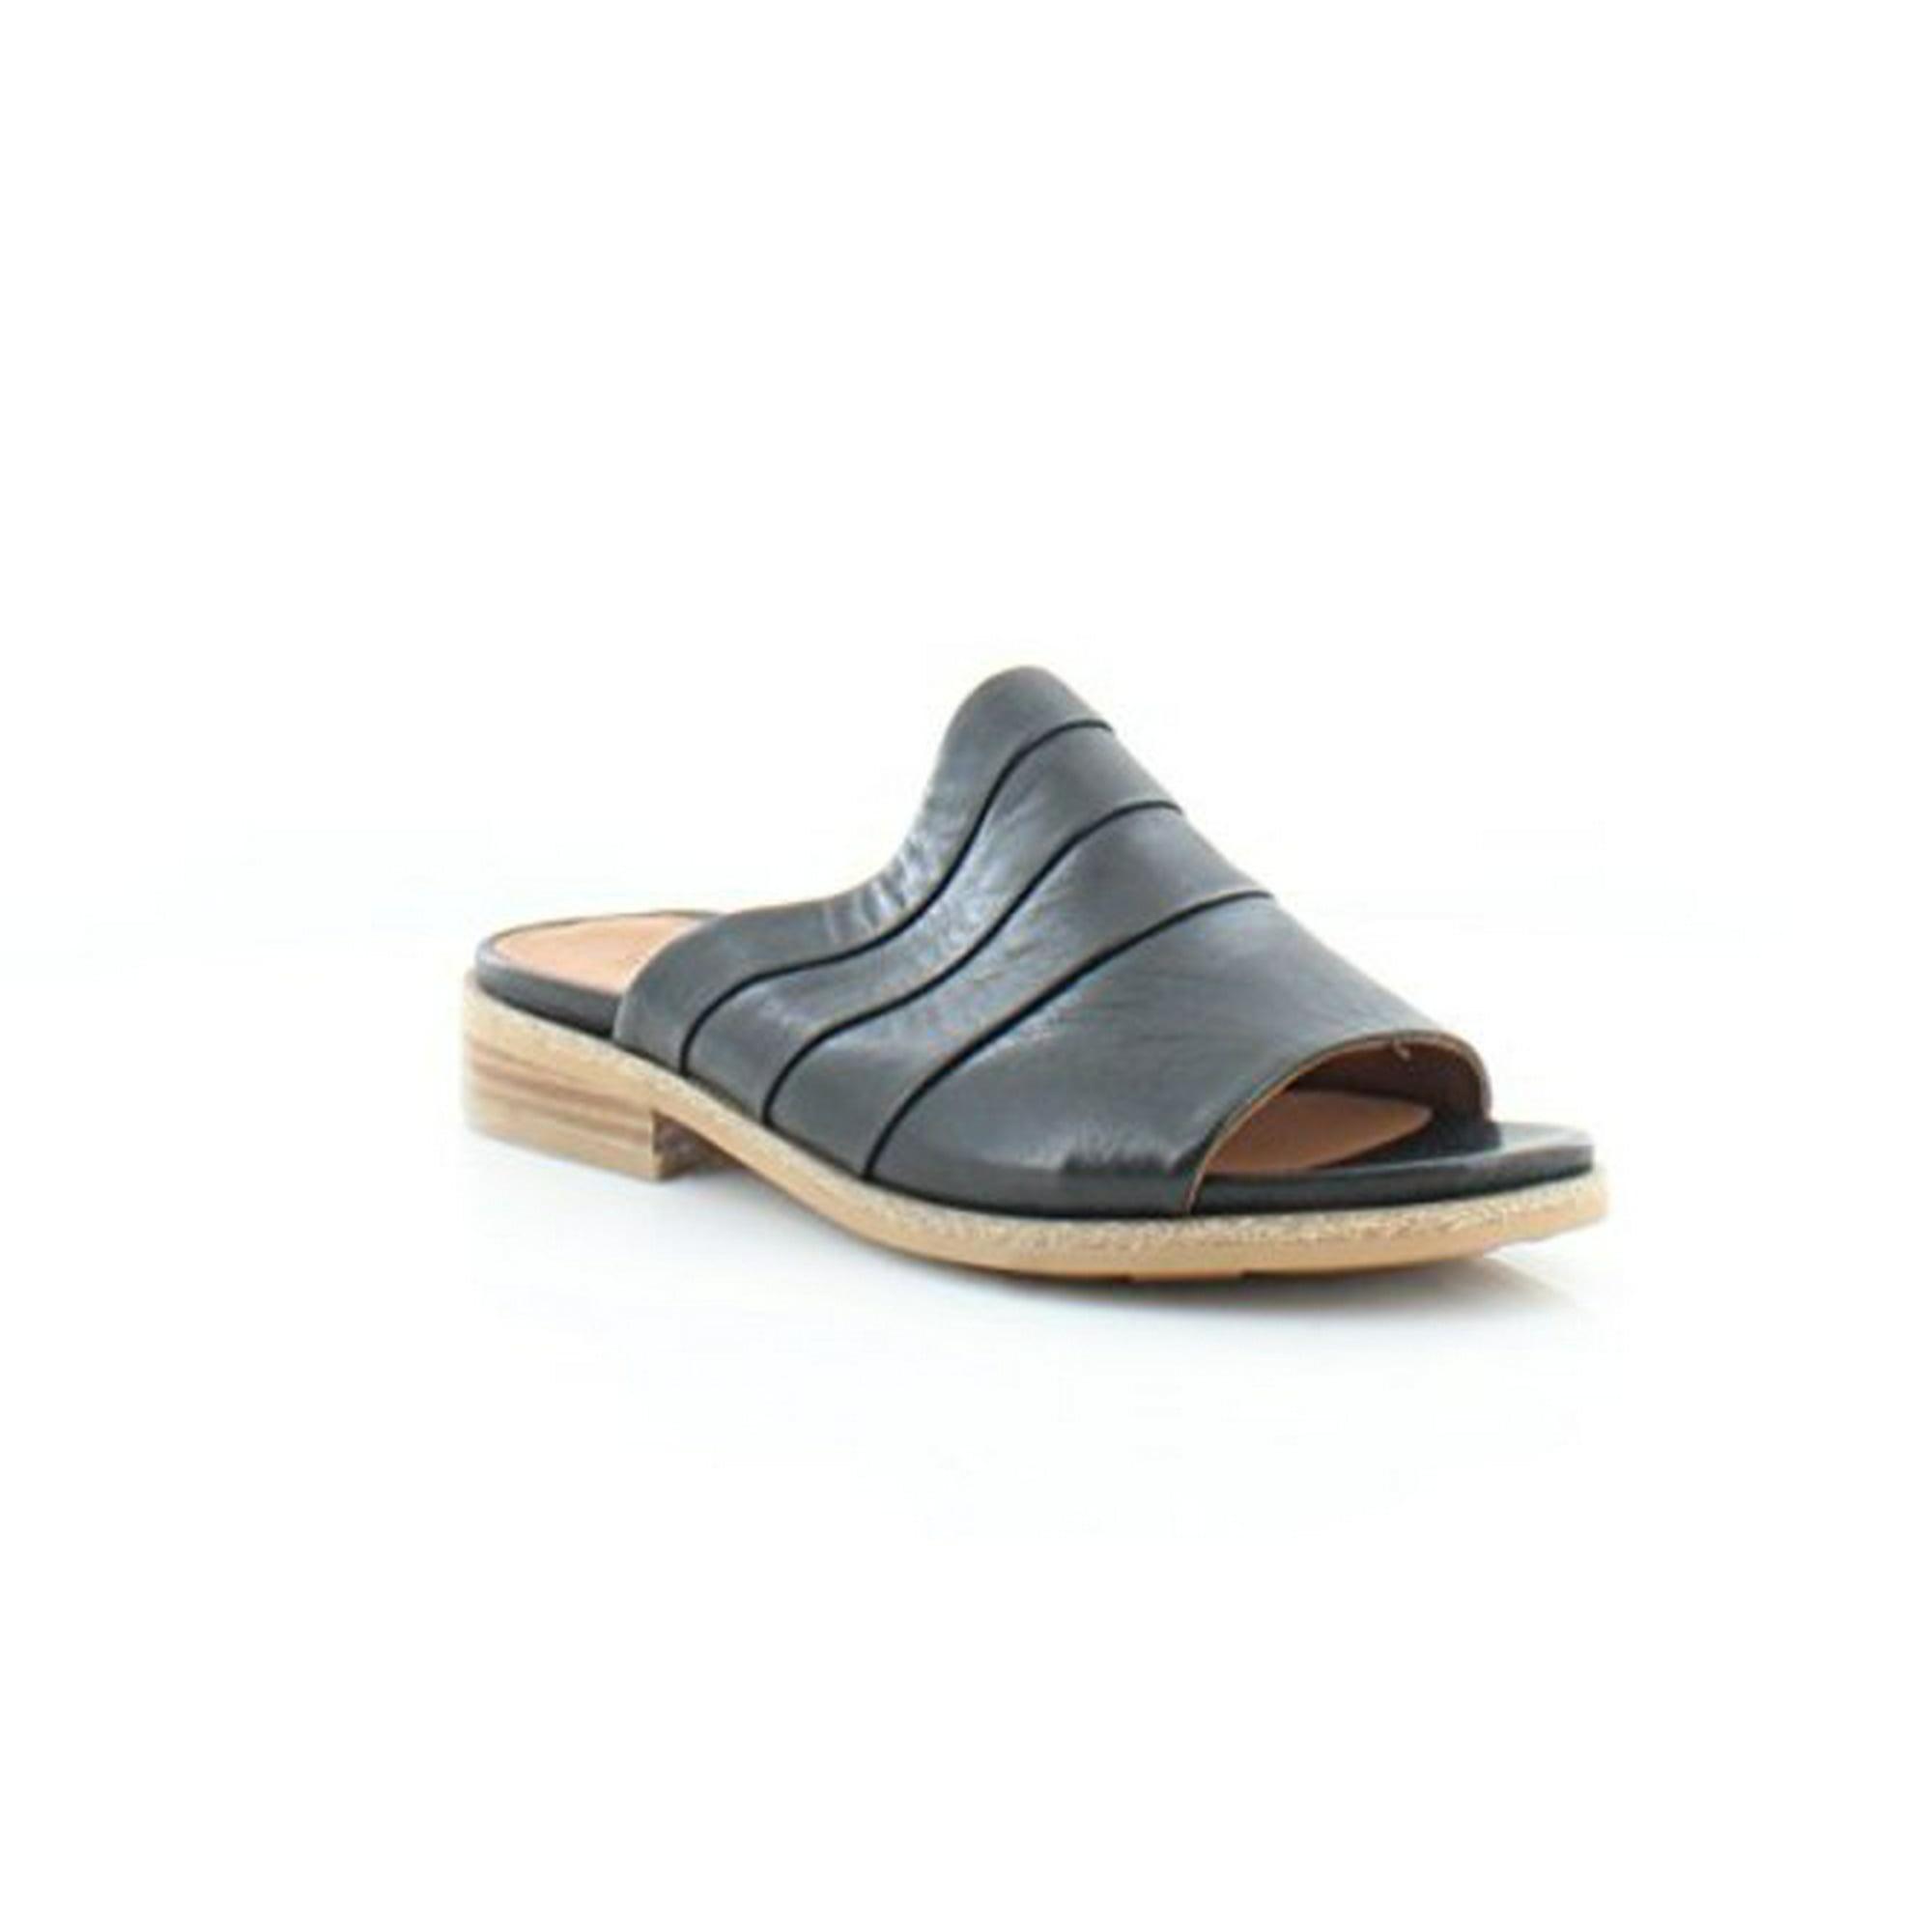 0c6b1dcda Gentle Souls Womens Gayle Leather Slide Sandal Shoes